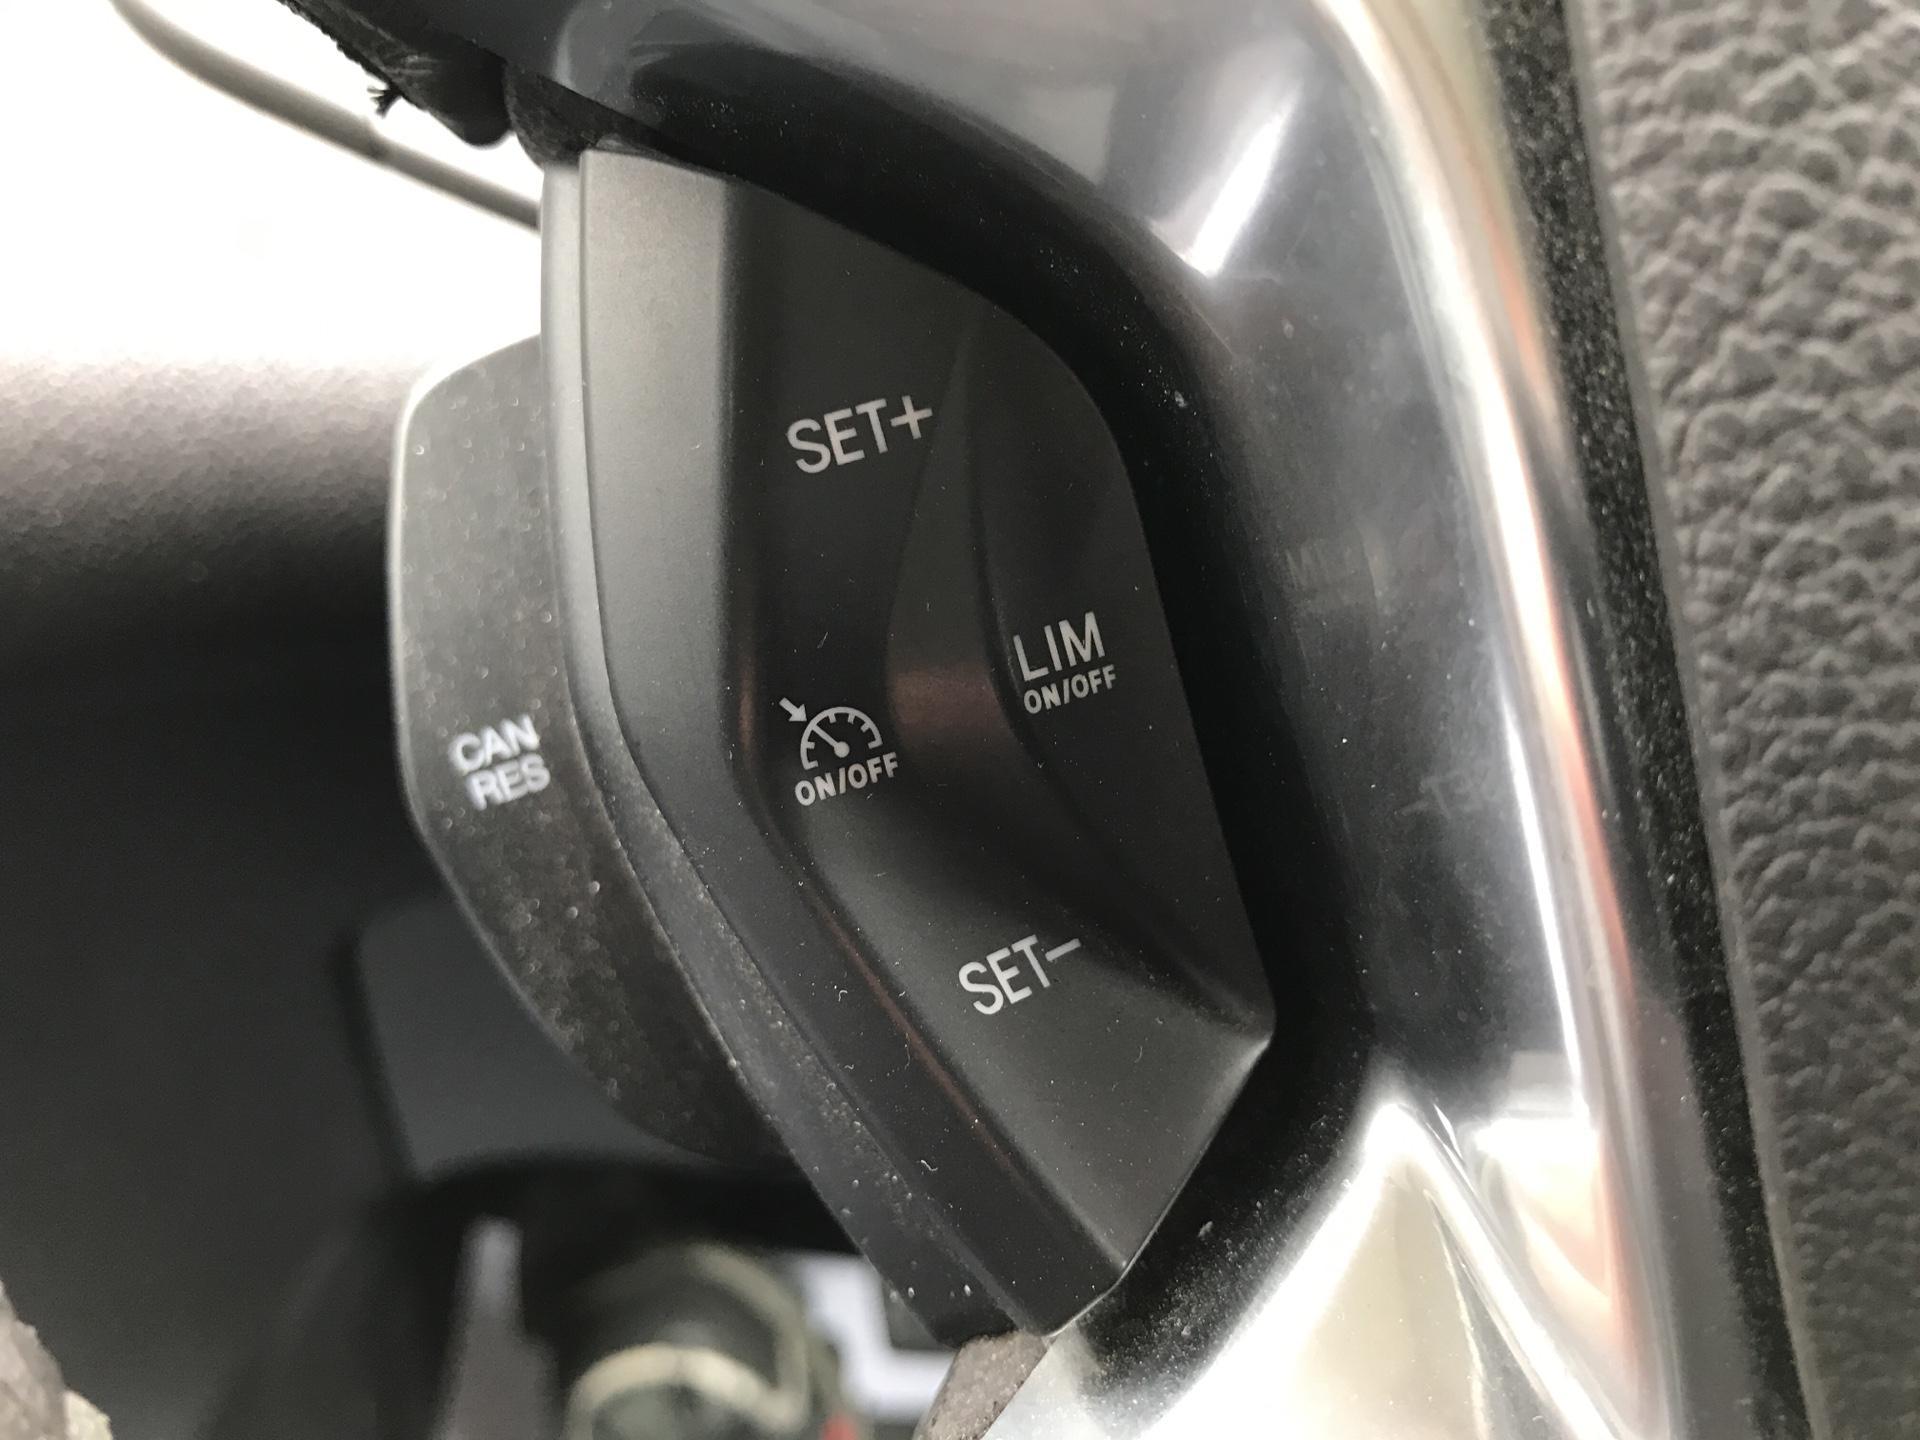 2016 Ford Transit Custom 290 L1 DIESEL FWD 2.2 TDCI 125PS LOW ROOF LIMITED VAN EURO 5 (DV16OKP) Image 17